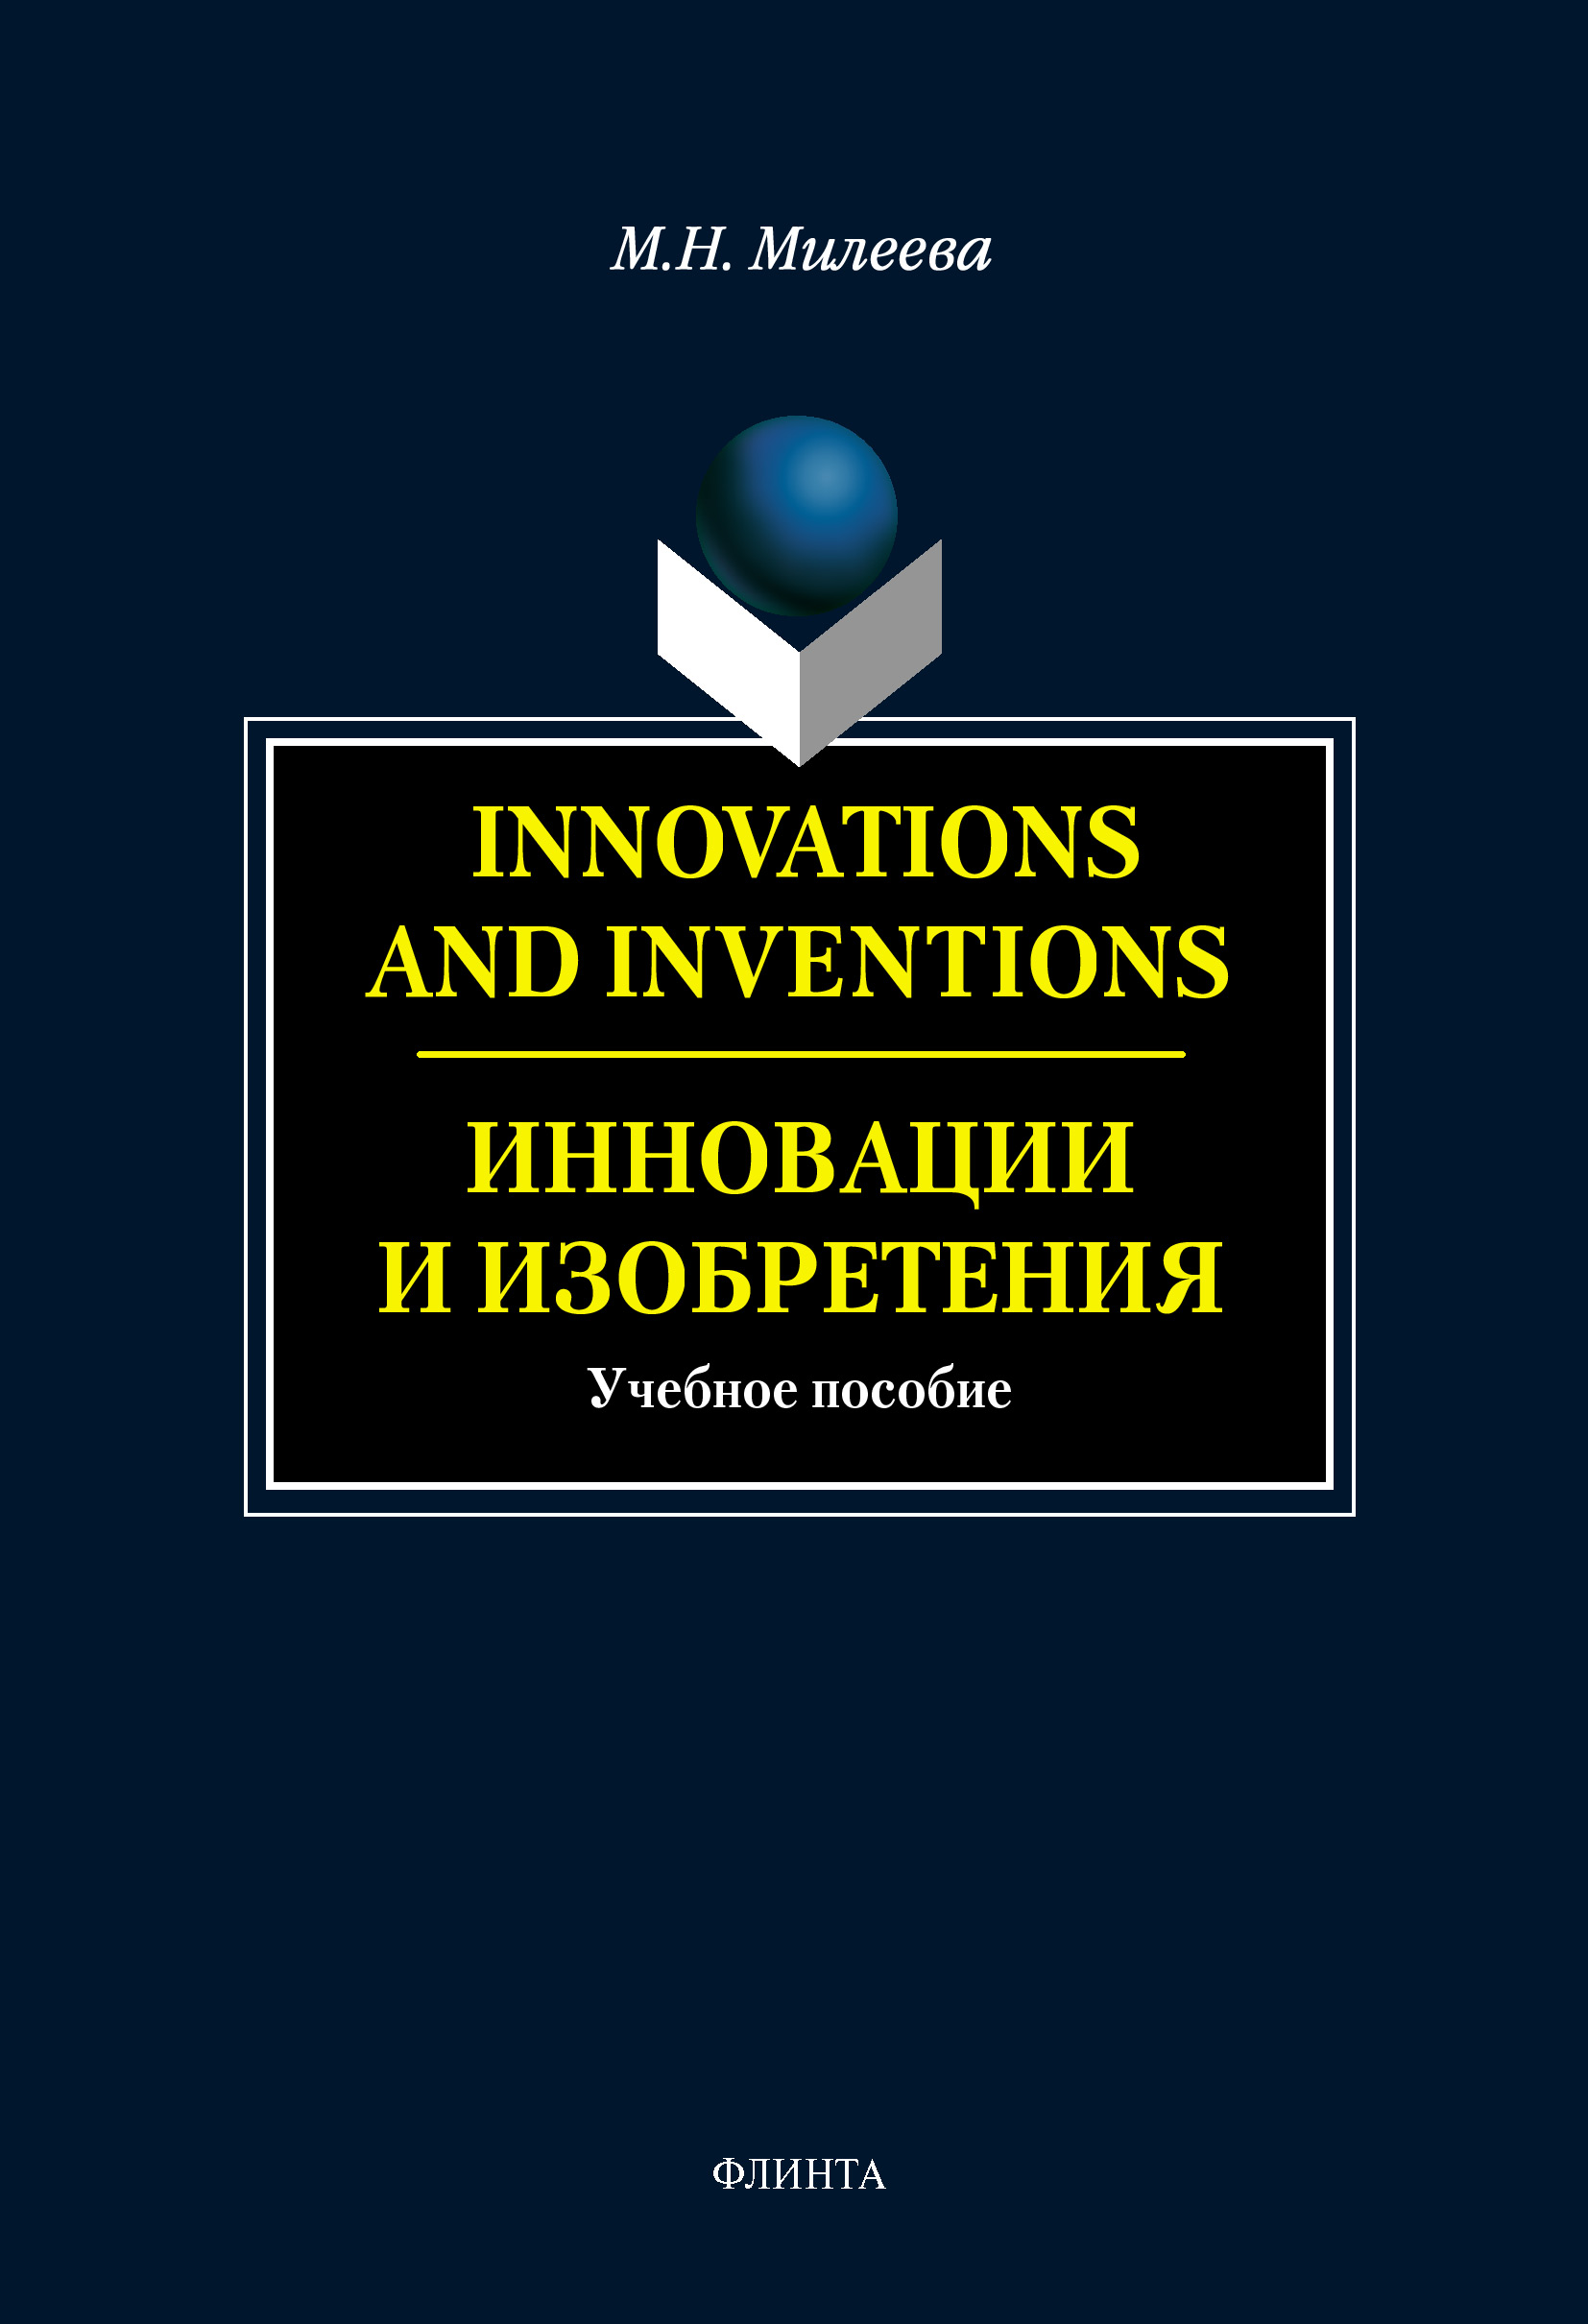 М. Н. Милеева Innovations and inventions. Инновации и изобретения john melady breakthrough canada s greatest inventions and innovations